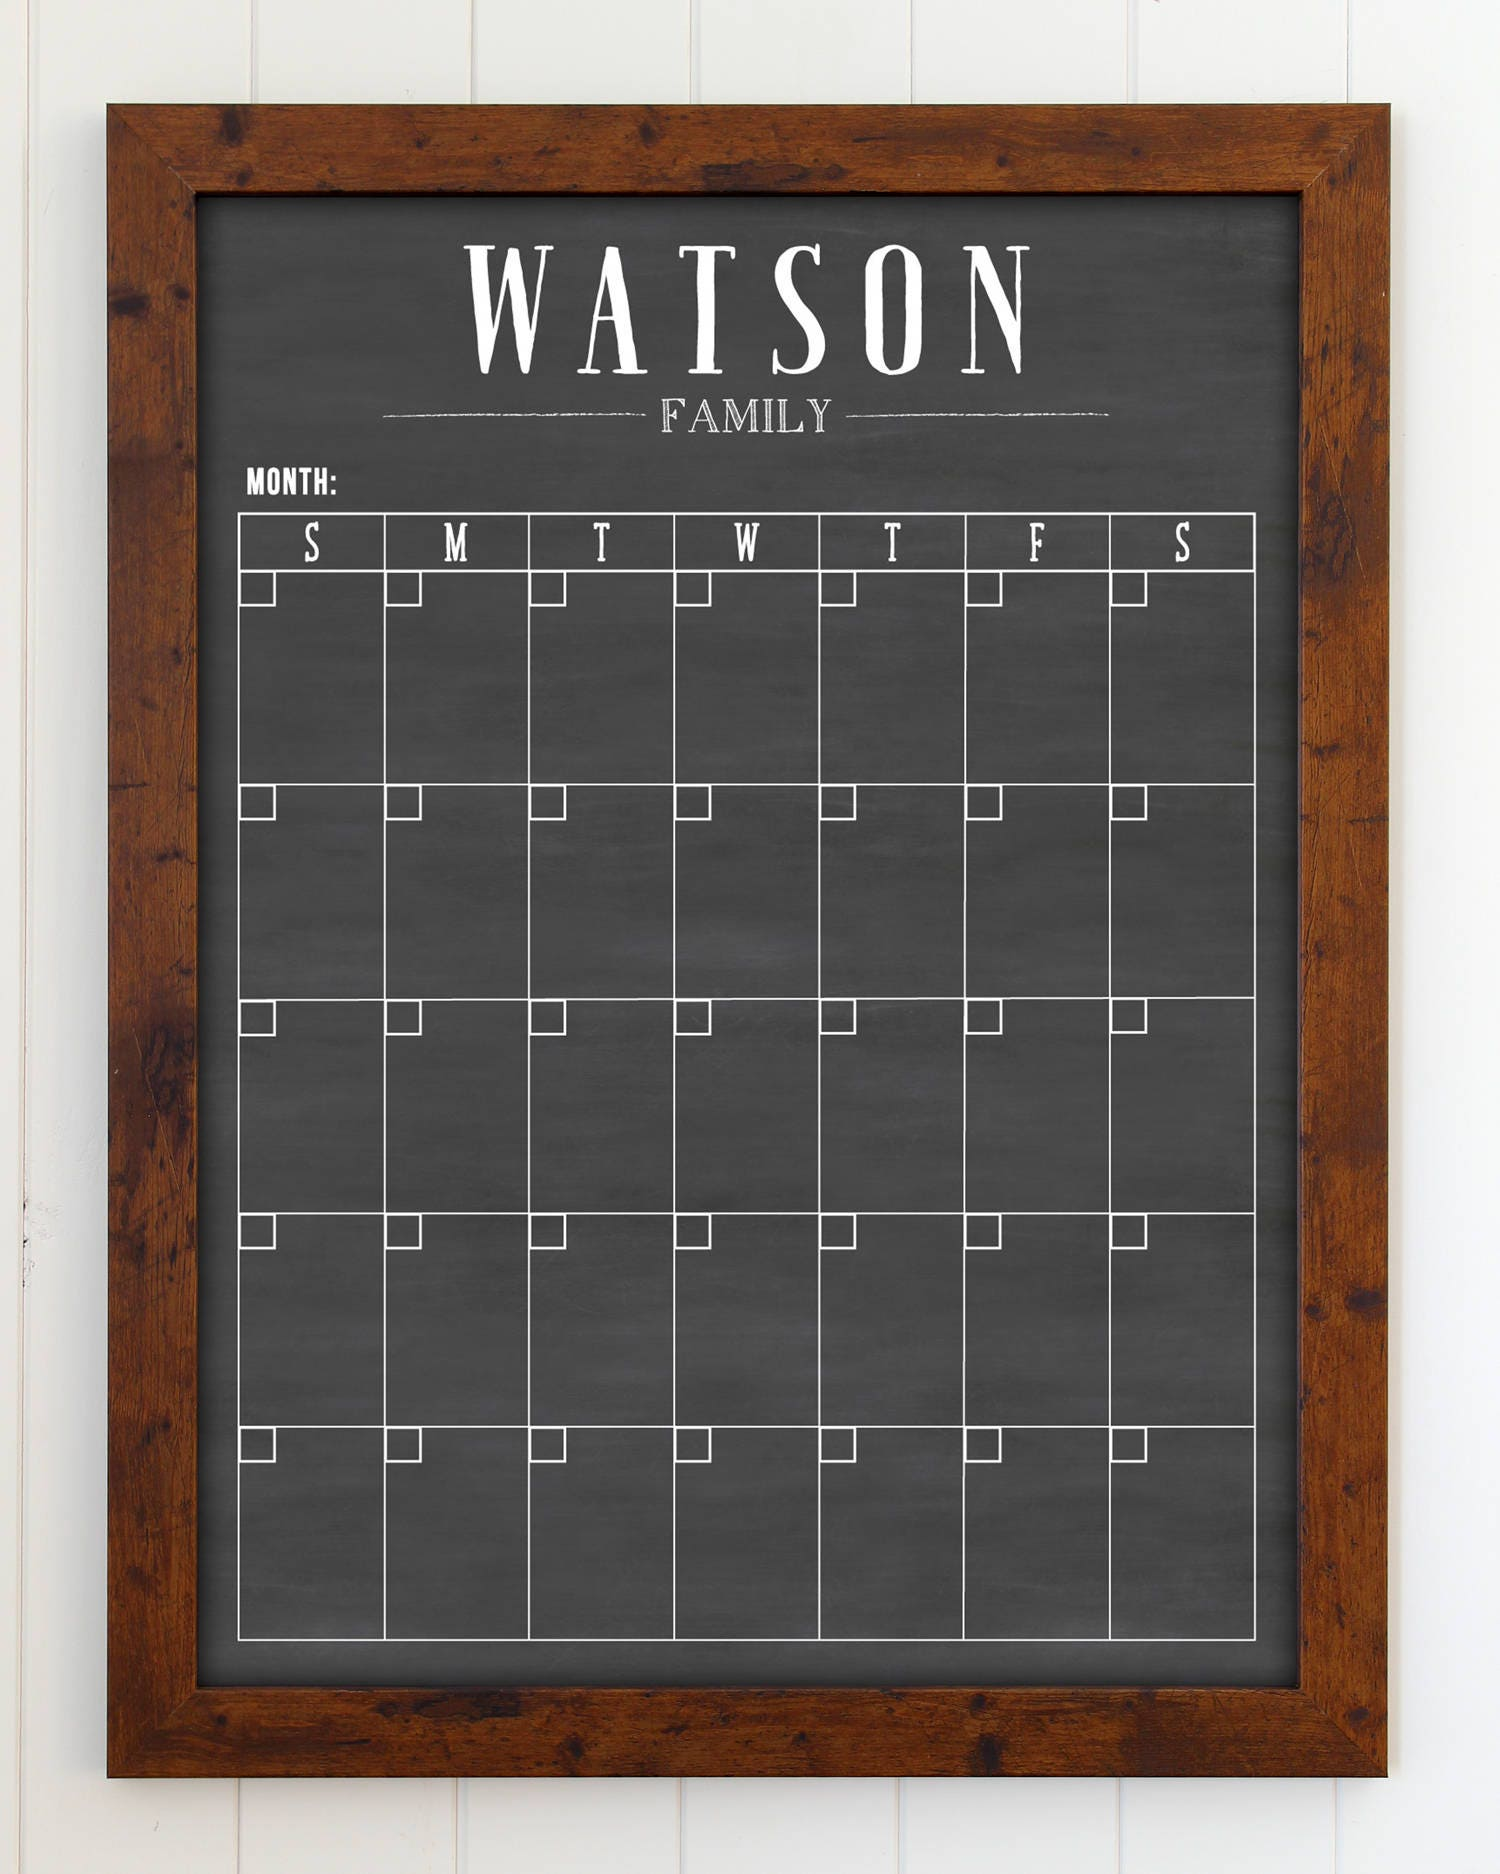 Familienkalender Tafel trocken abwischbaren Kalender